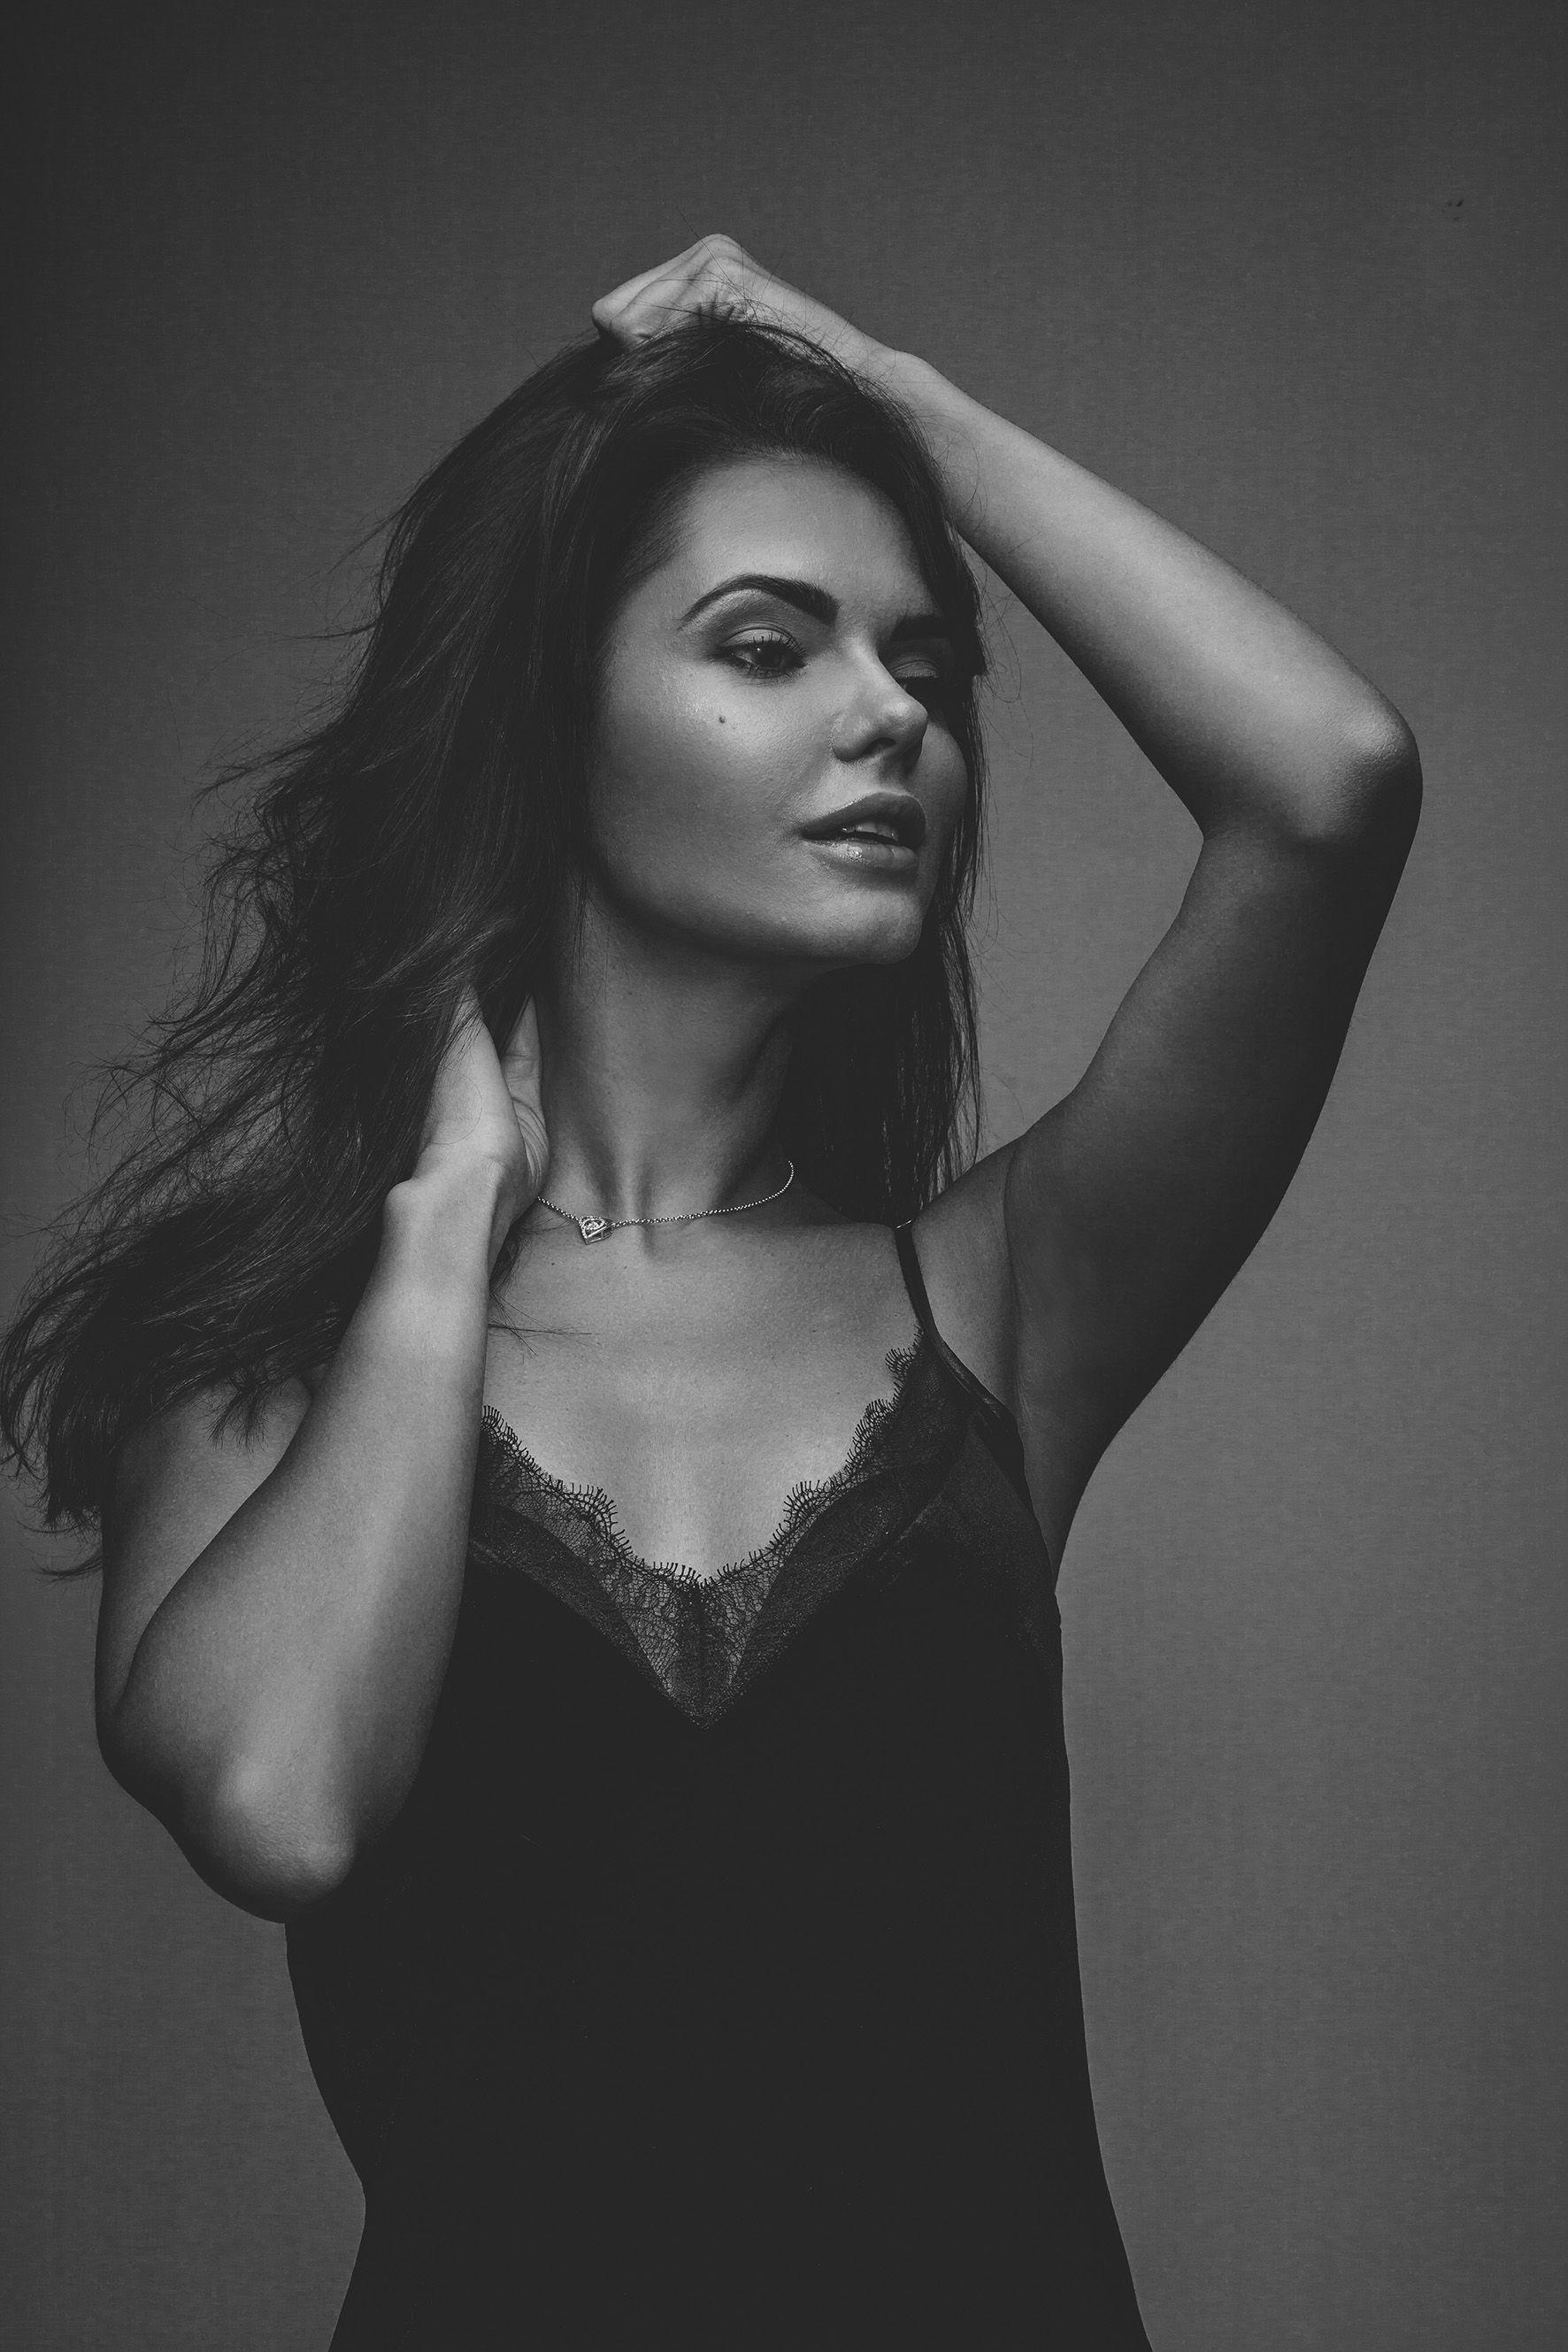 Black and white photoshoot photography ideas